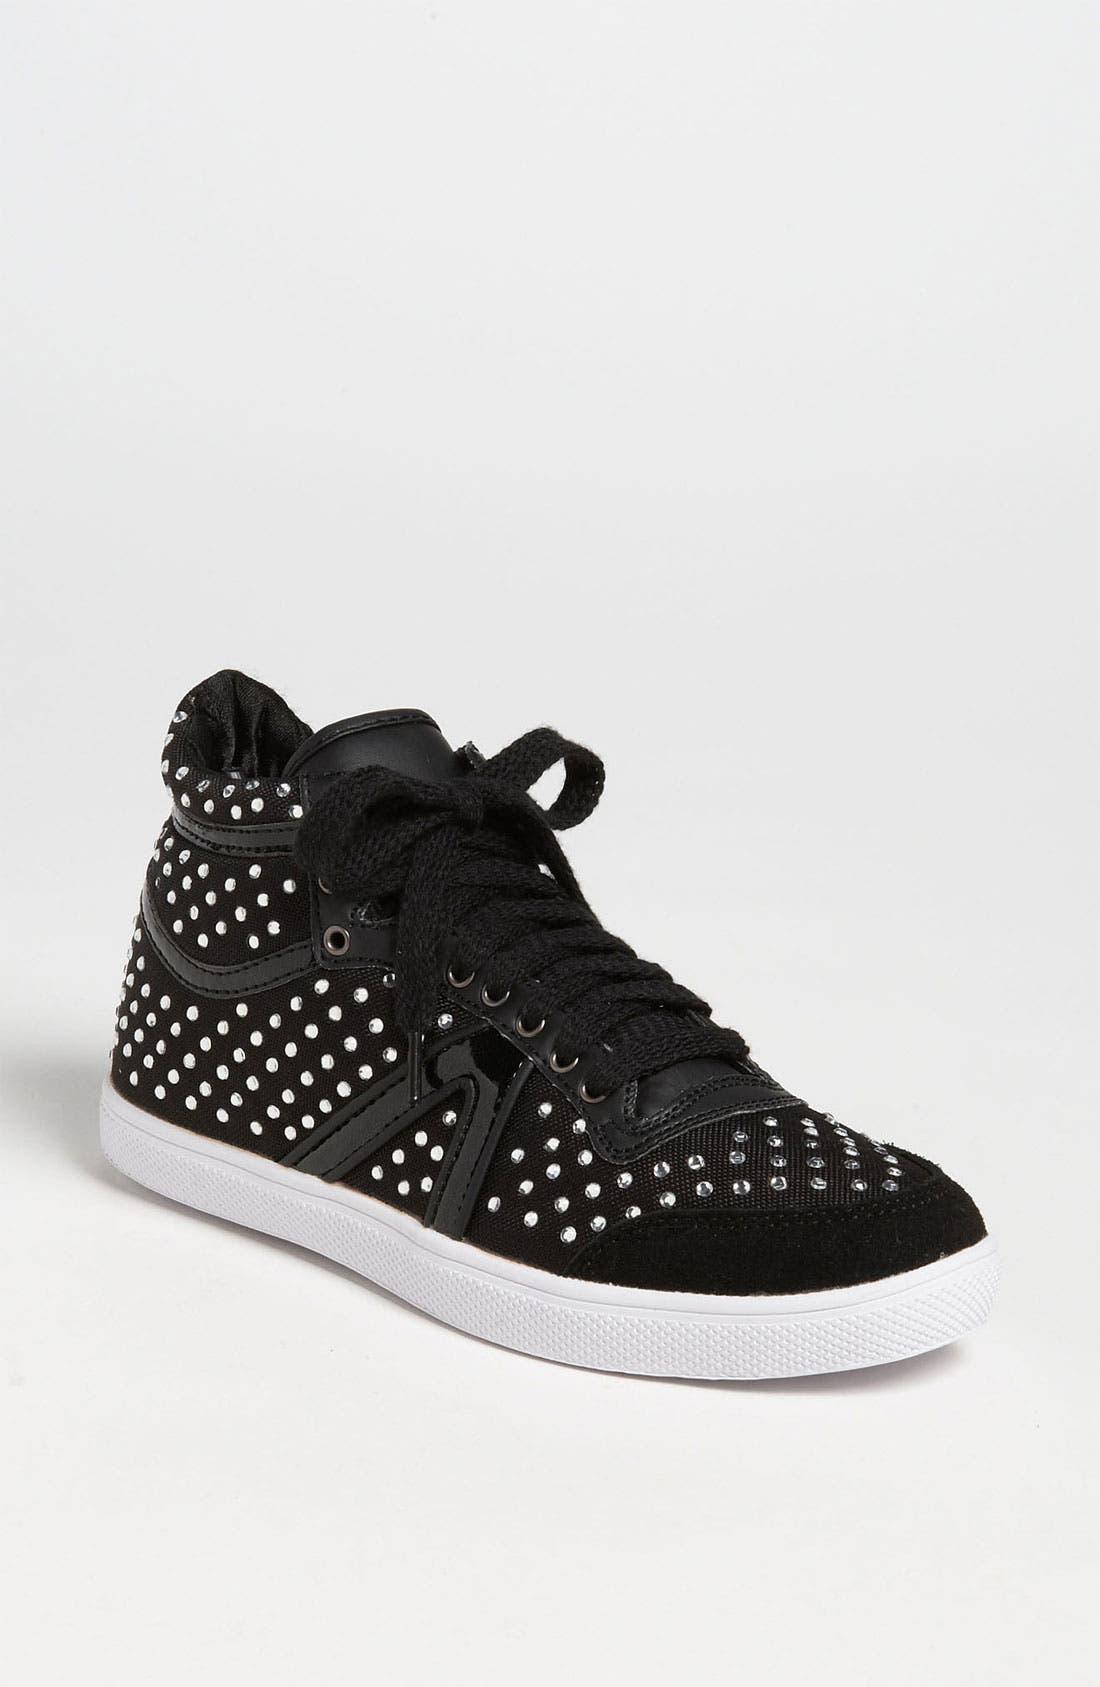 Alternate Image 1 Selected - Topshop 'Tiki-Gem' High Top Sneaker